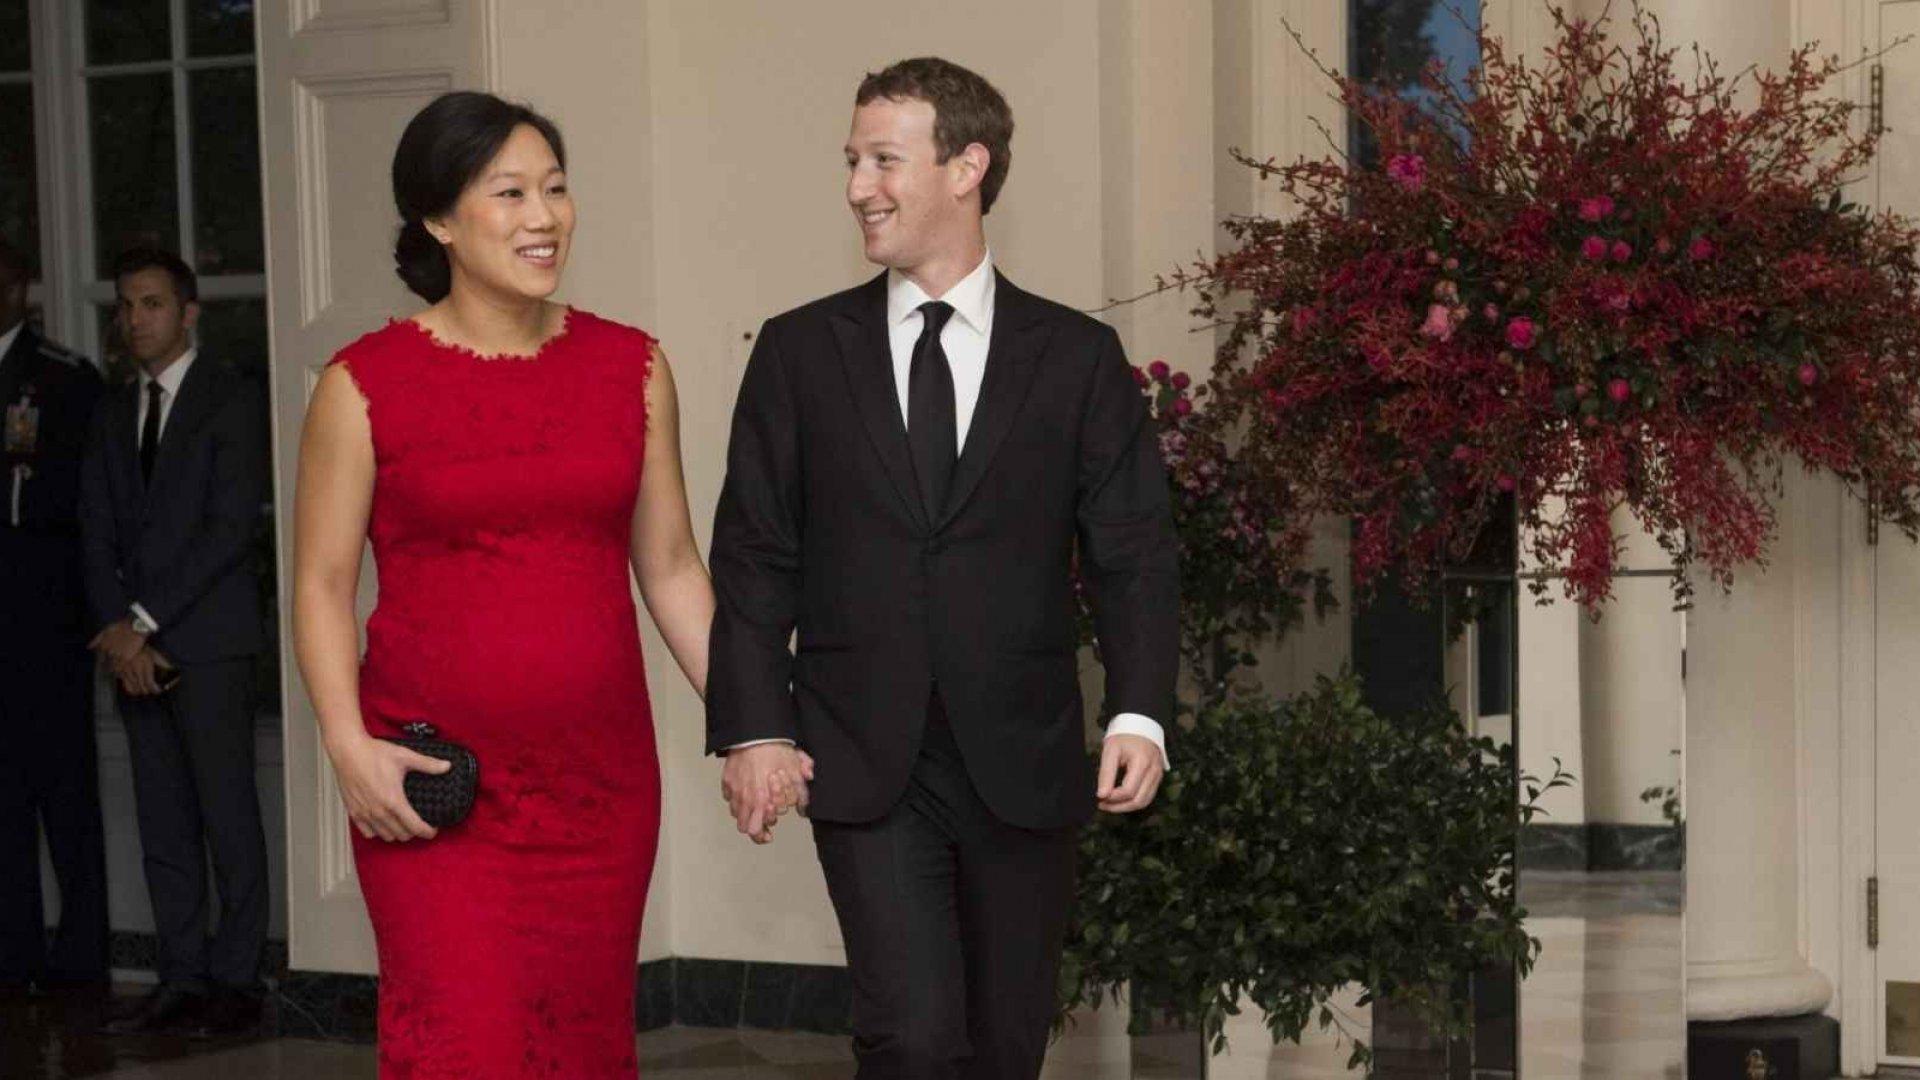 Facebook founder Mark Zuckerberg (right), and wife Priscilla Chan